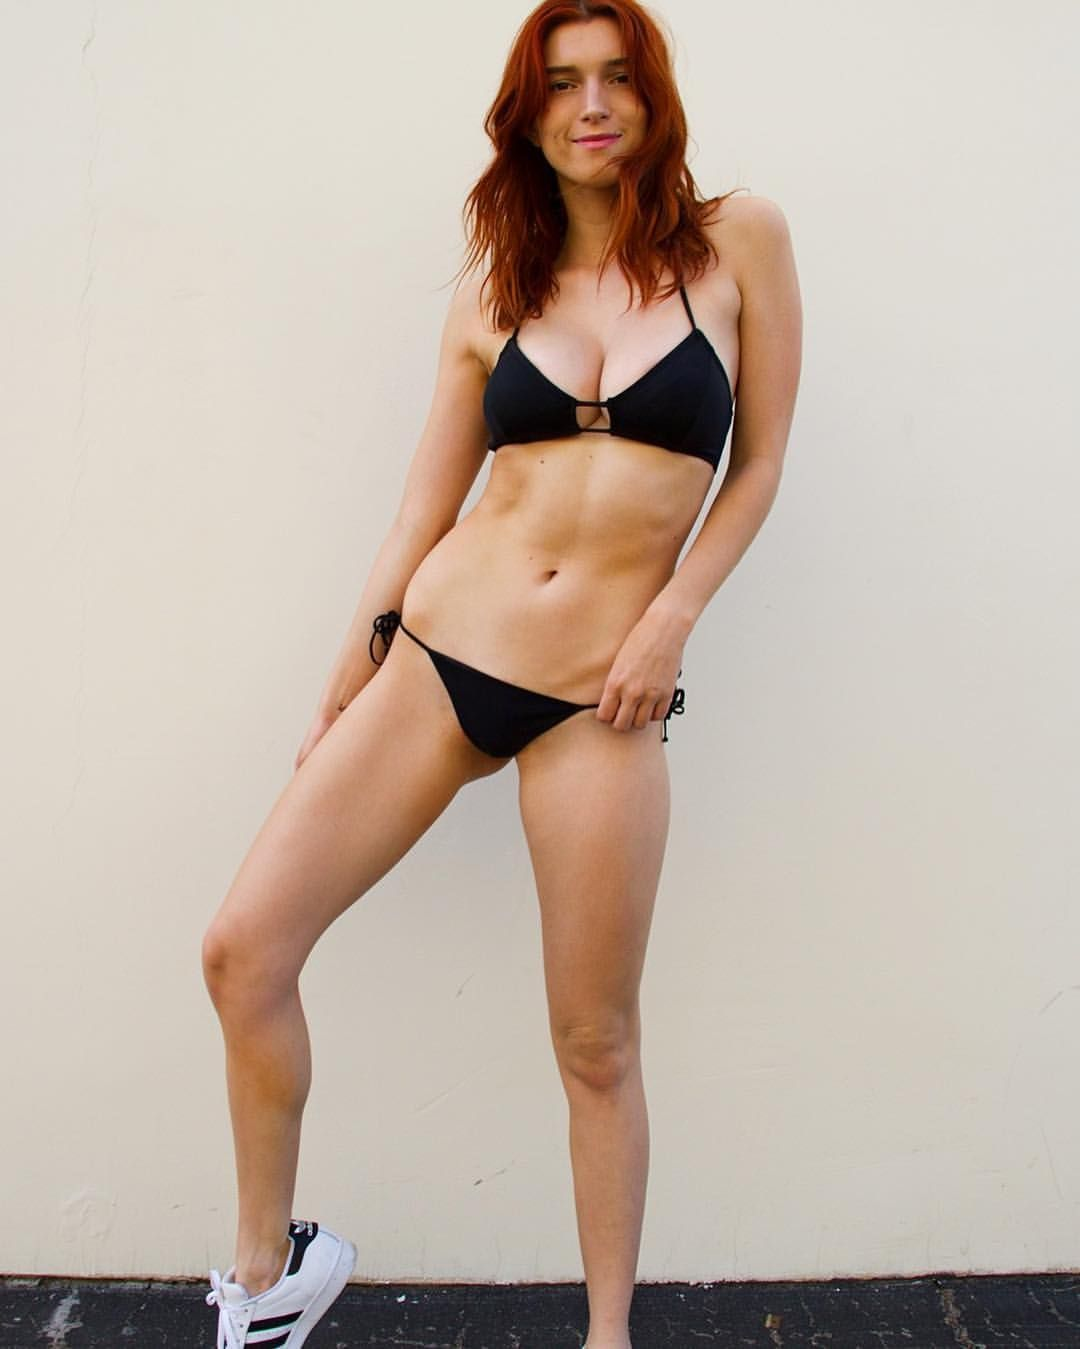 Dani-Thorne-Sexy-Photos-14